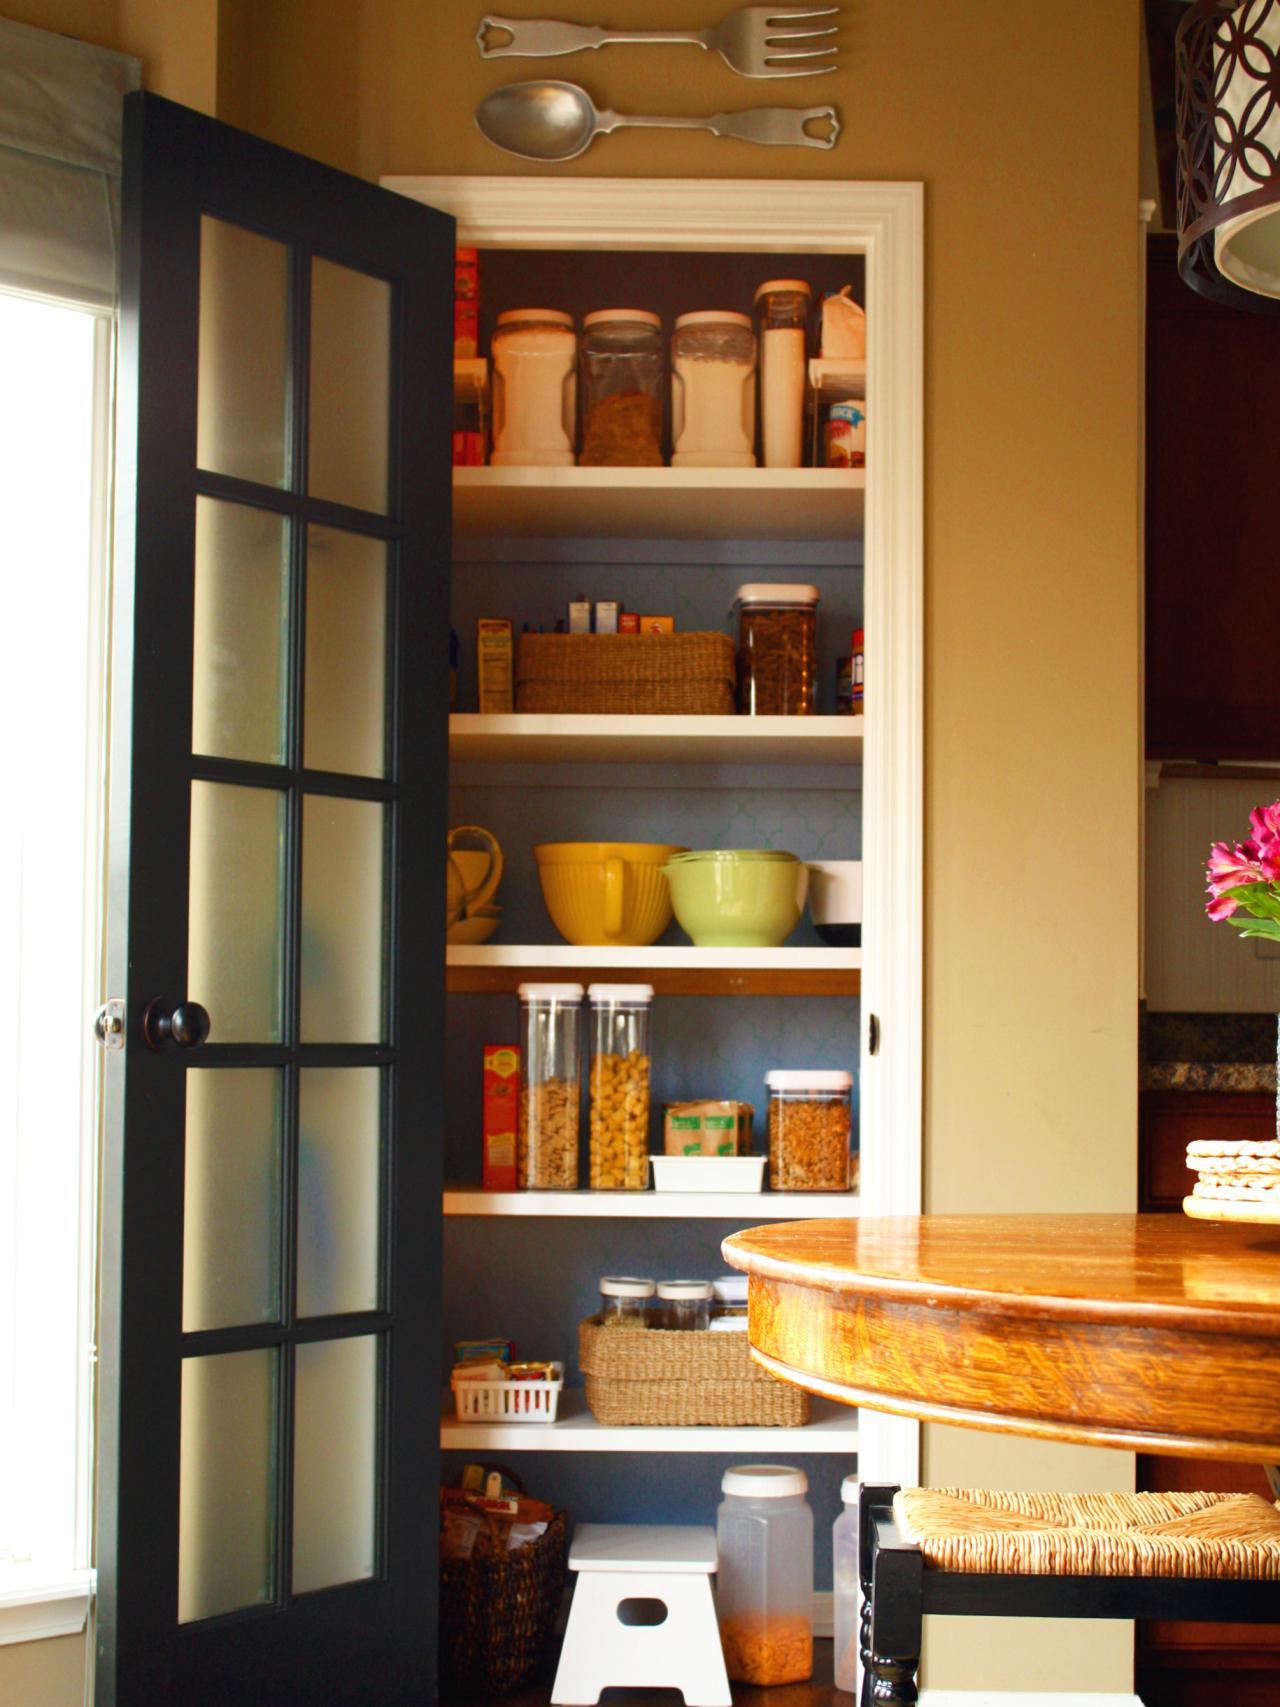 Design Ideas For Kitchen Pantry Doors Diy Kitchen Design